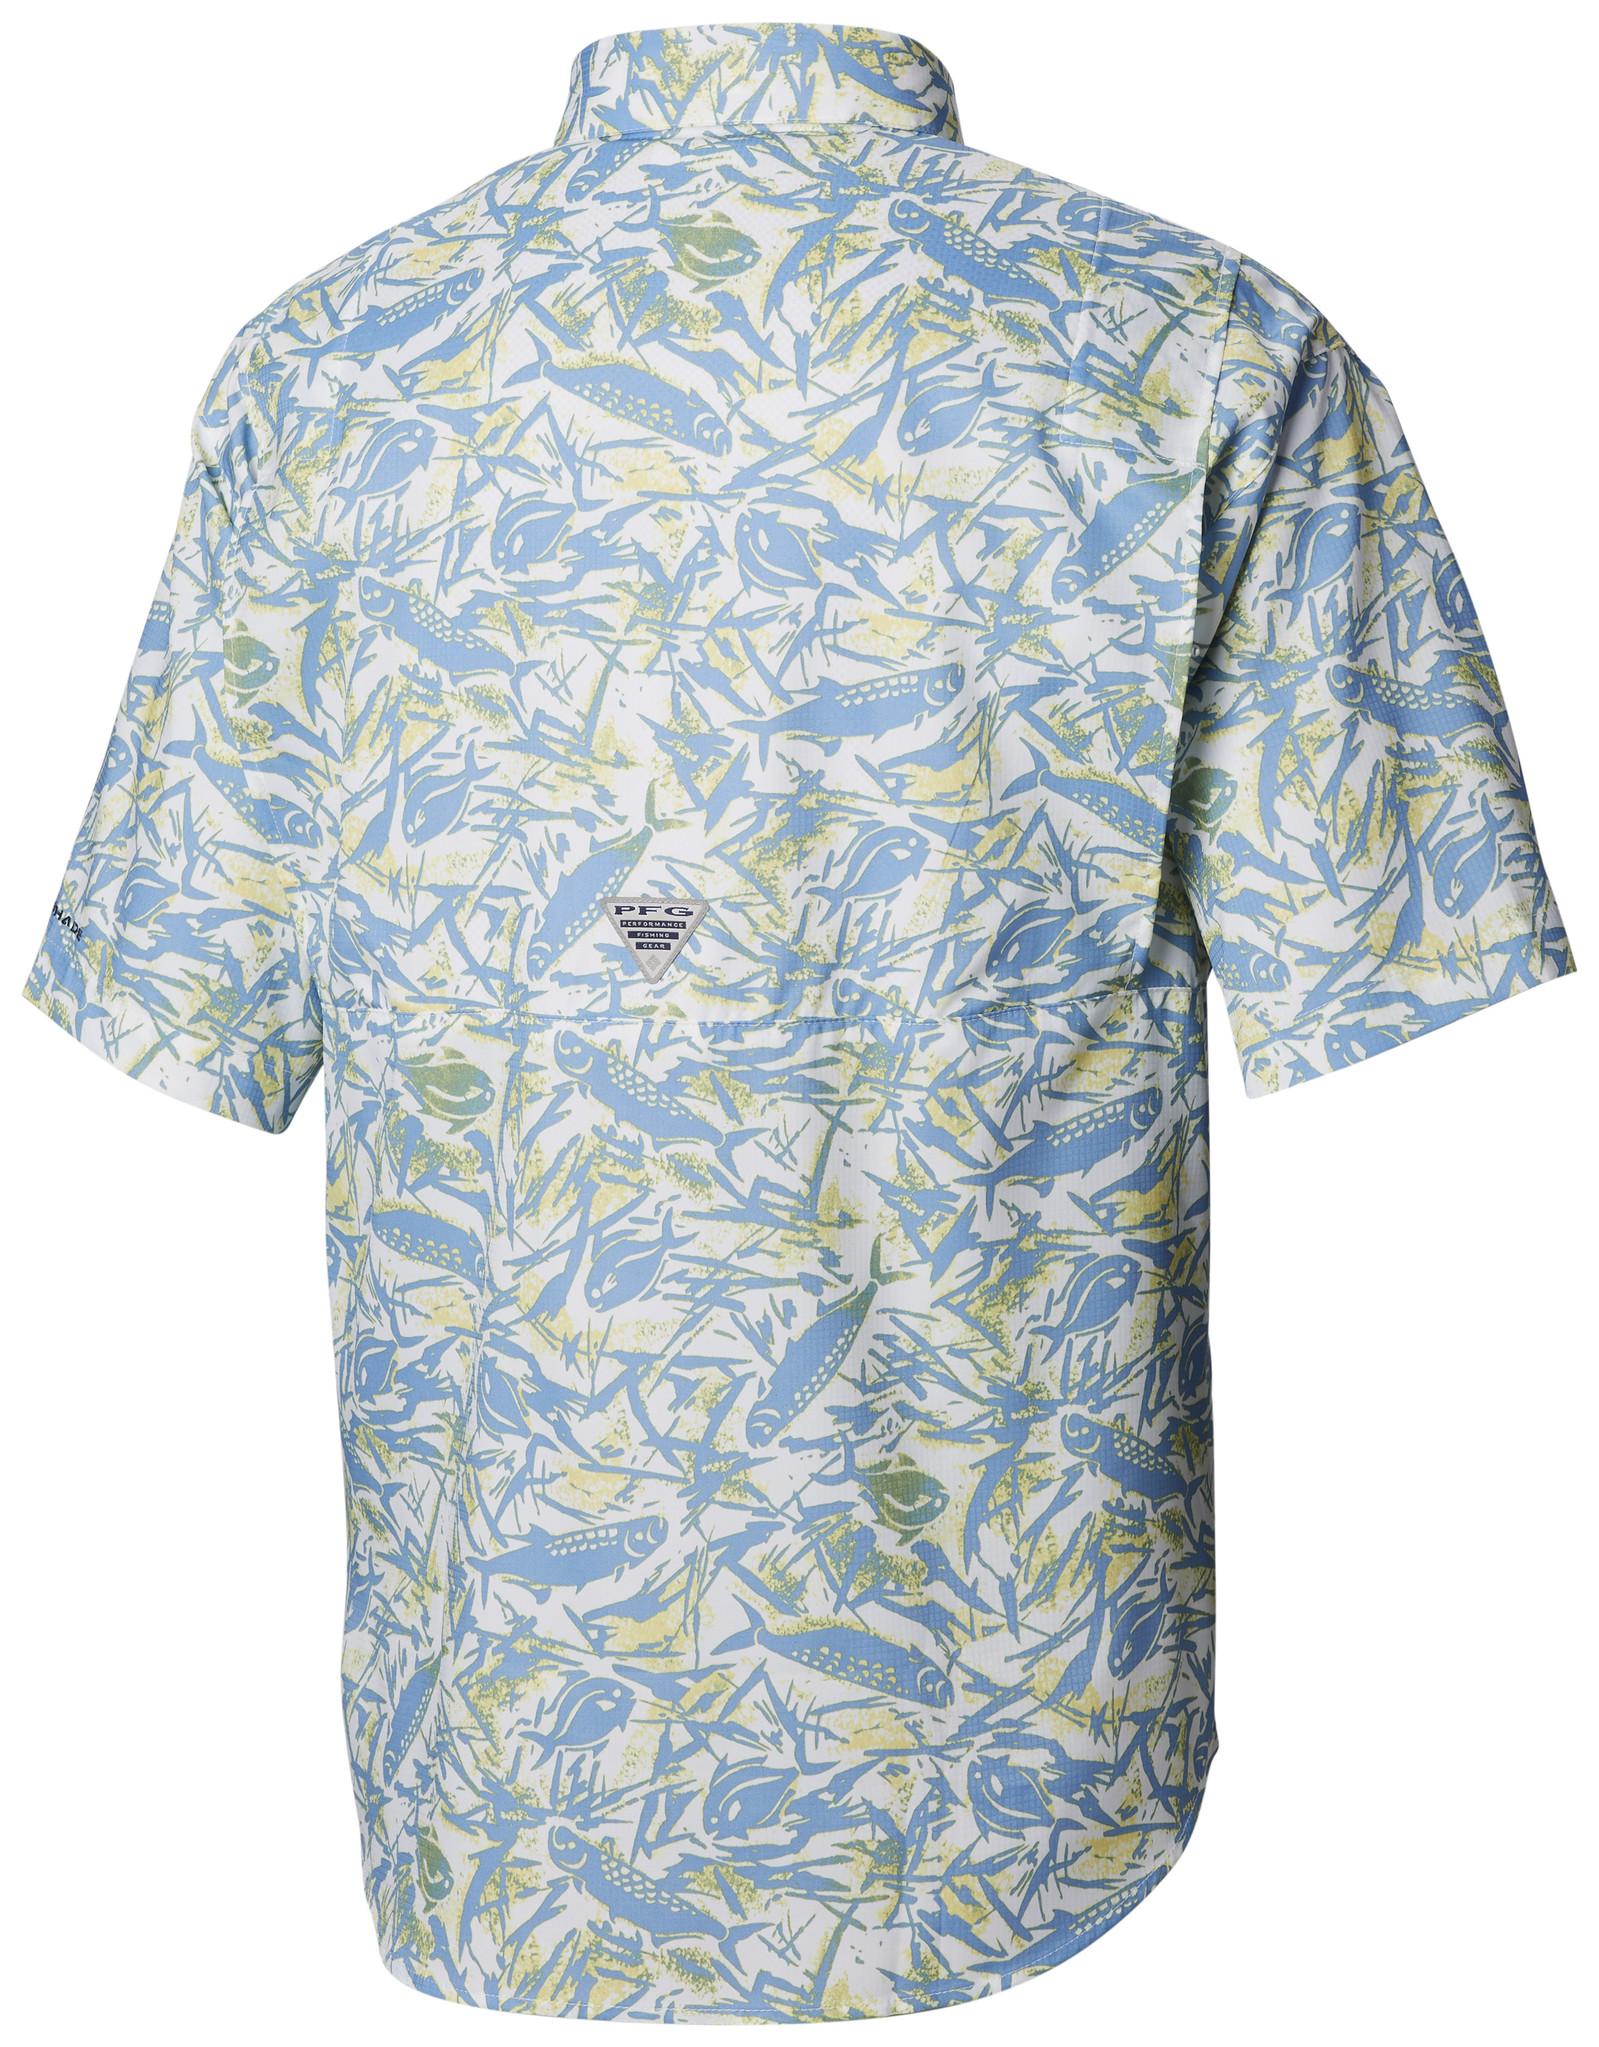 Columbia Sportwear Columbia PFG Super Tamiami Short Sleeve Shirt